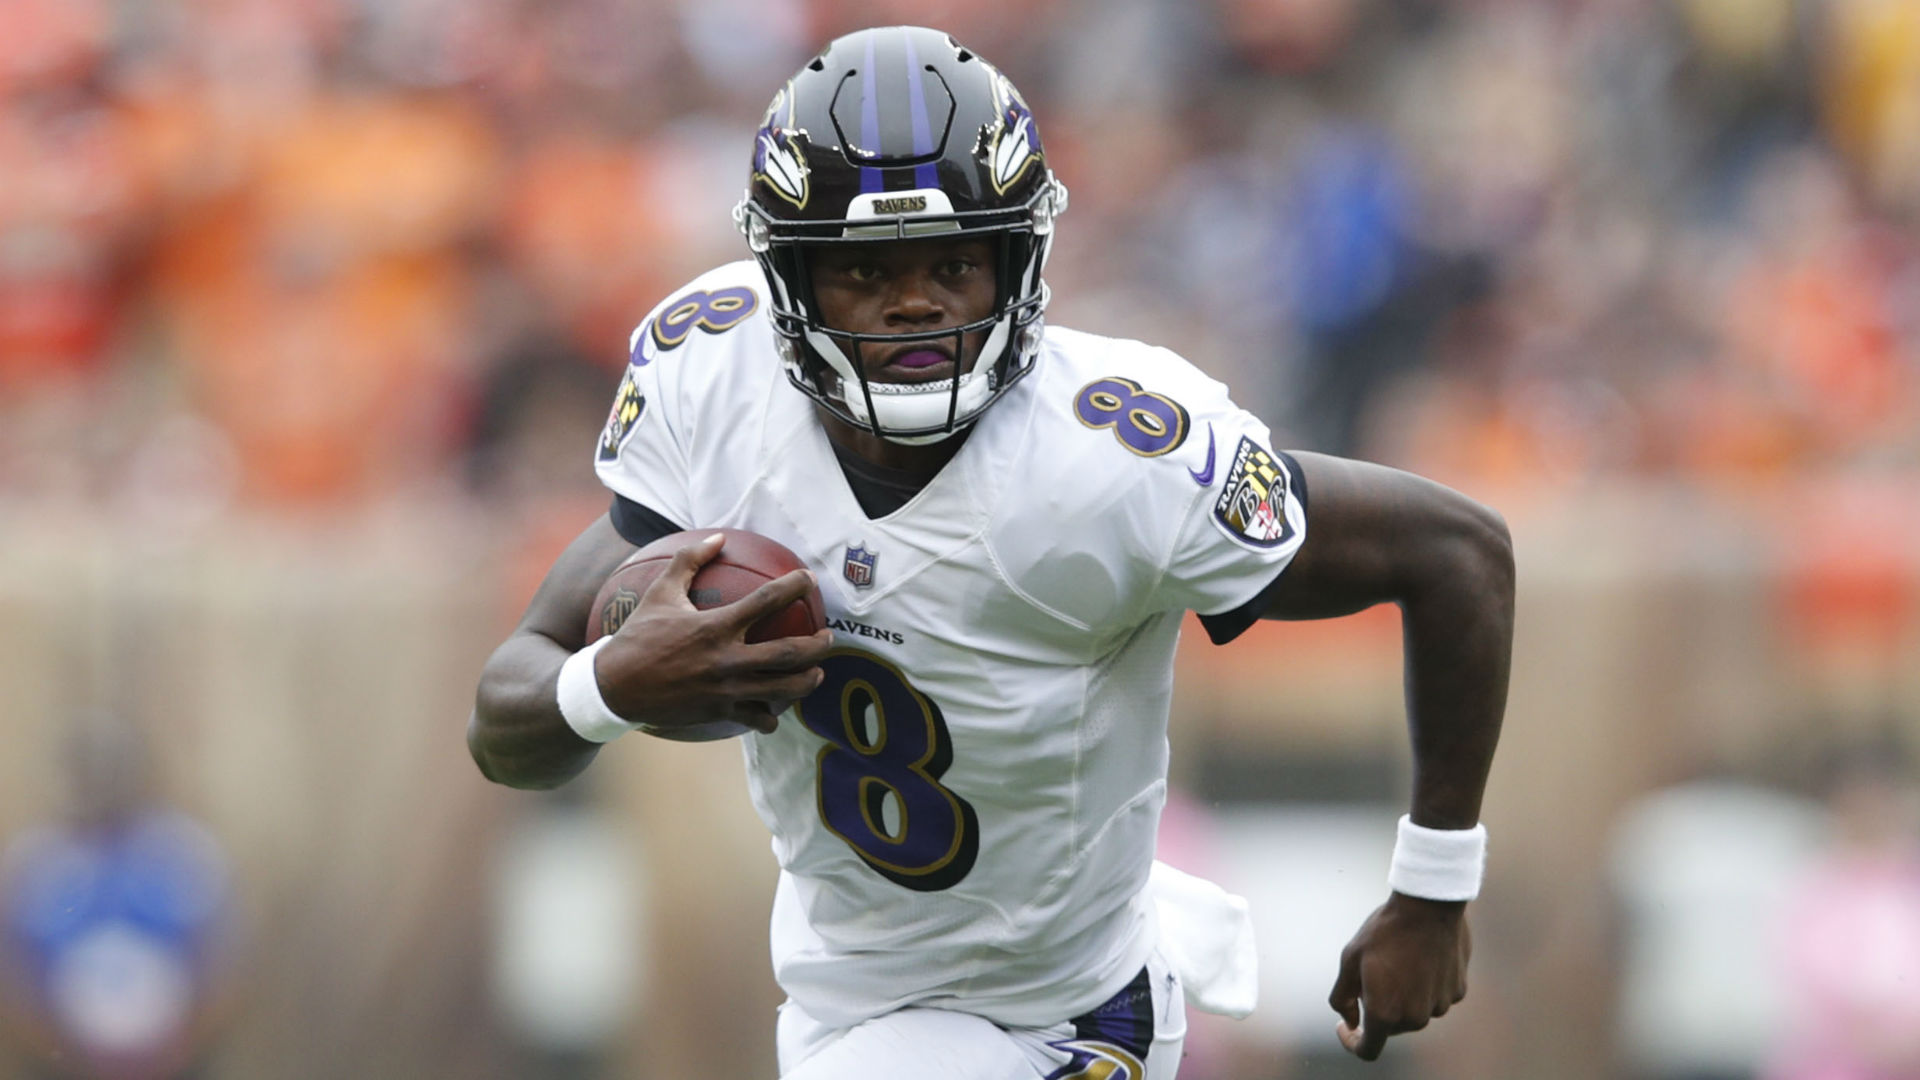 Ravens Qb Lamar Jackson Clears Concussion Protocol